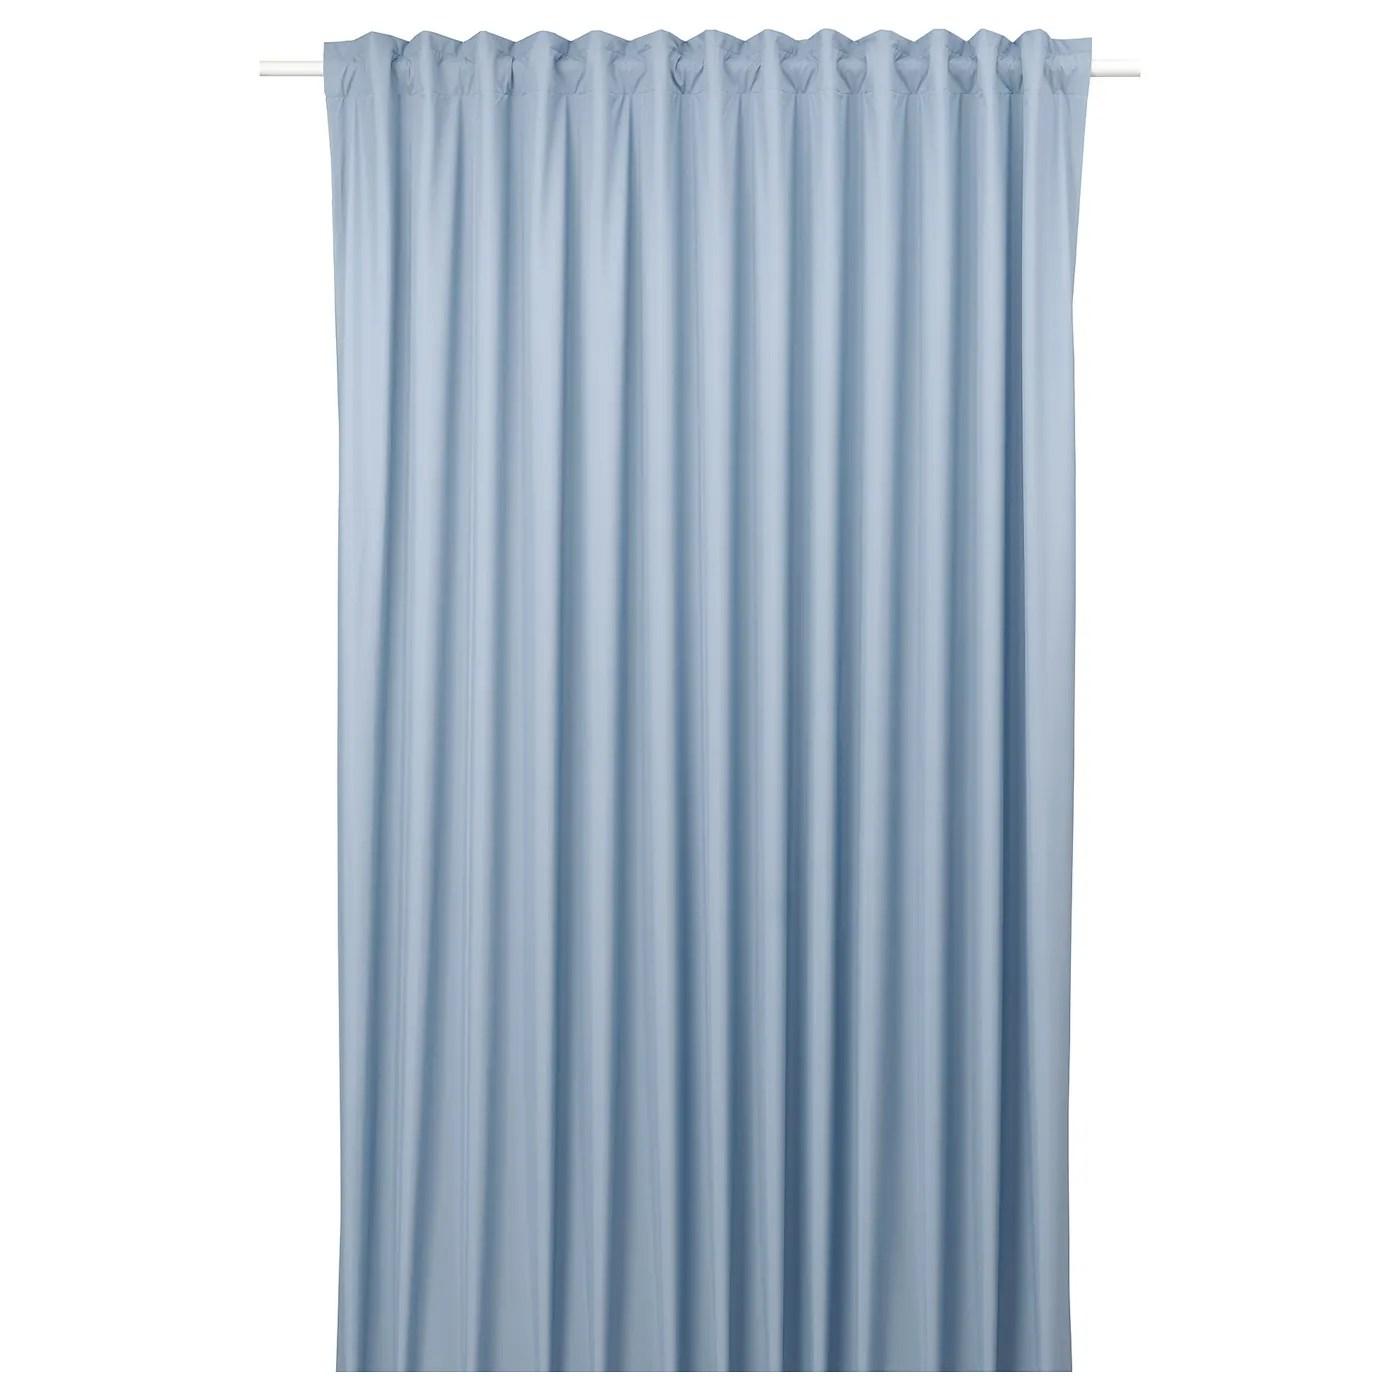 bengta rideau opaque 1 longueur bleu 83x98 210x250 cm